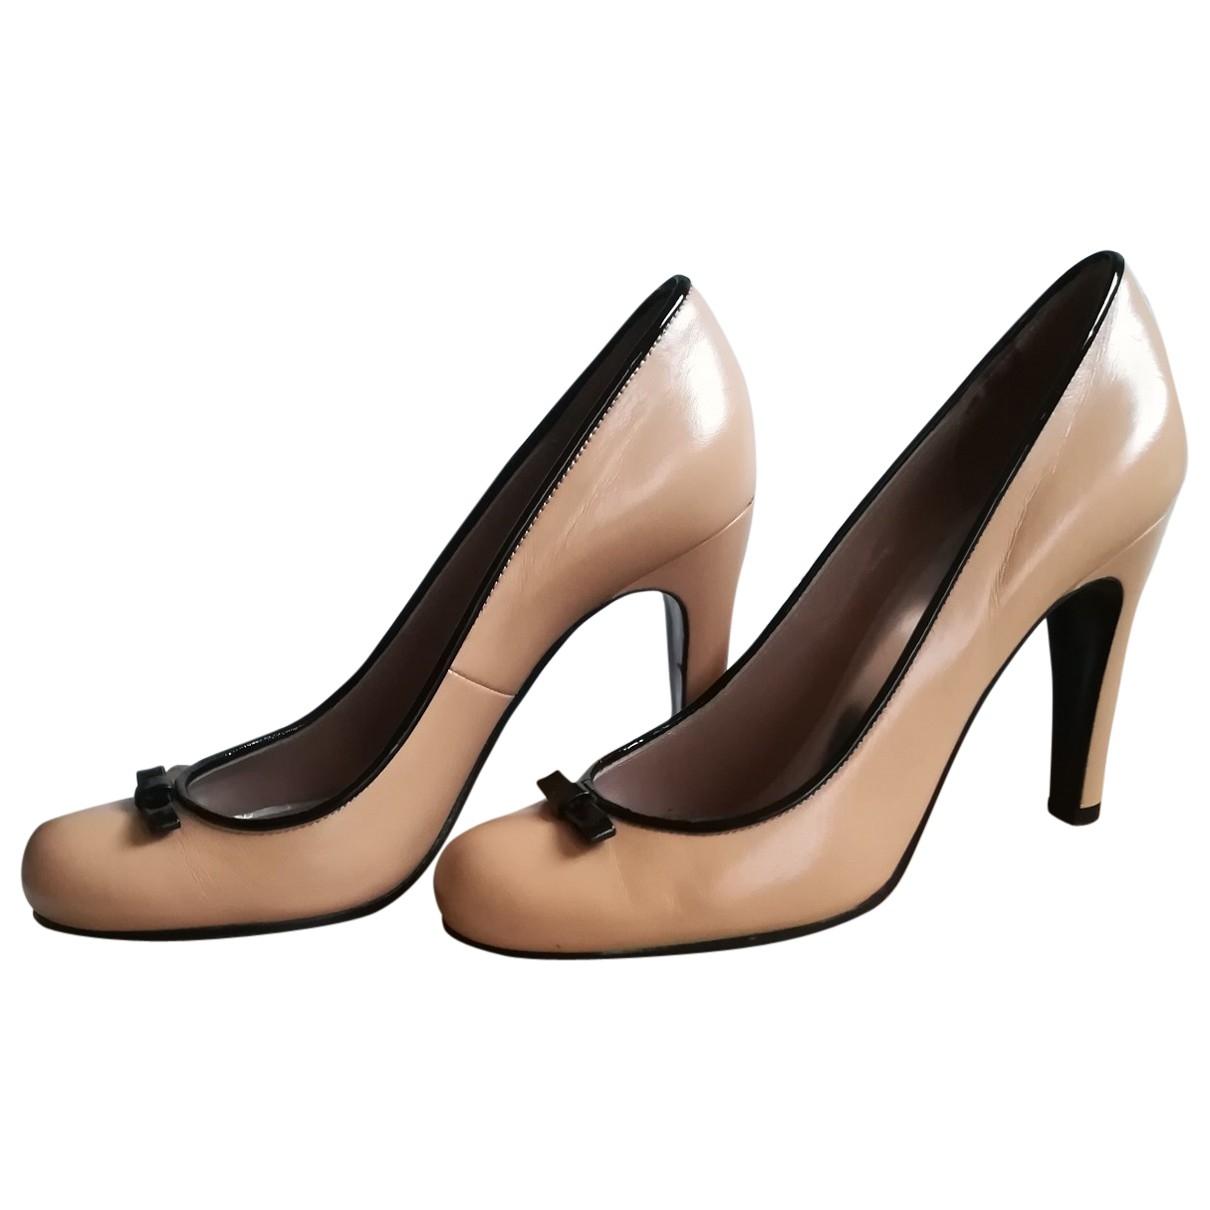 Marc By Marc Jacobs \N Beige Leather Heels for Women 37 EU